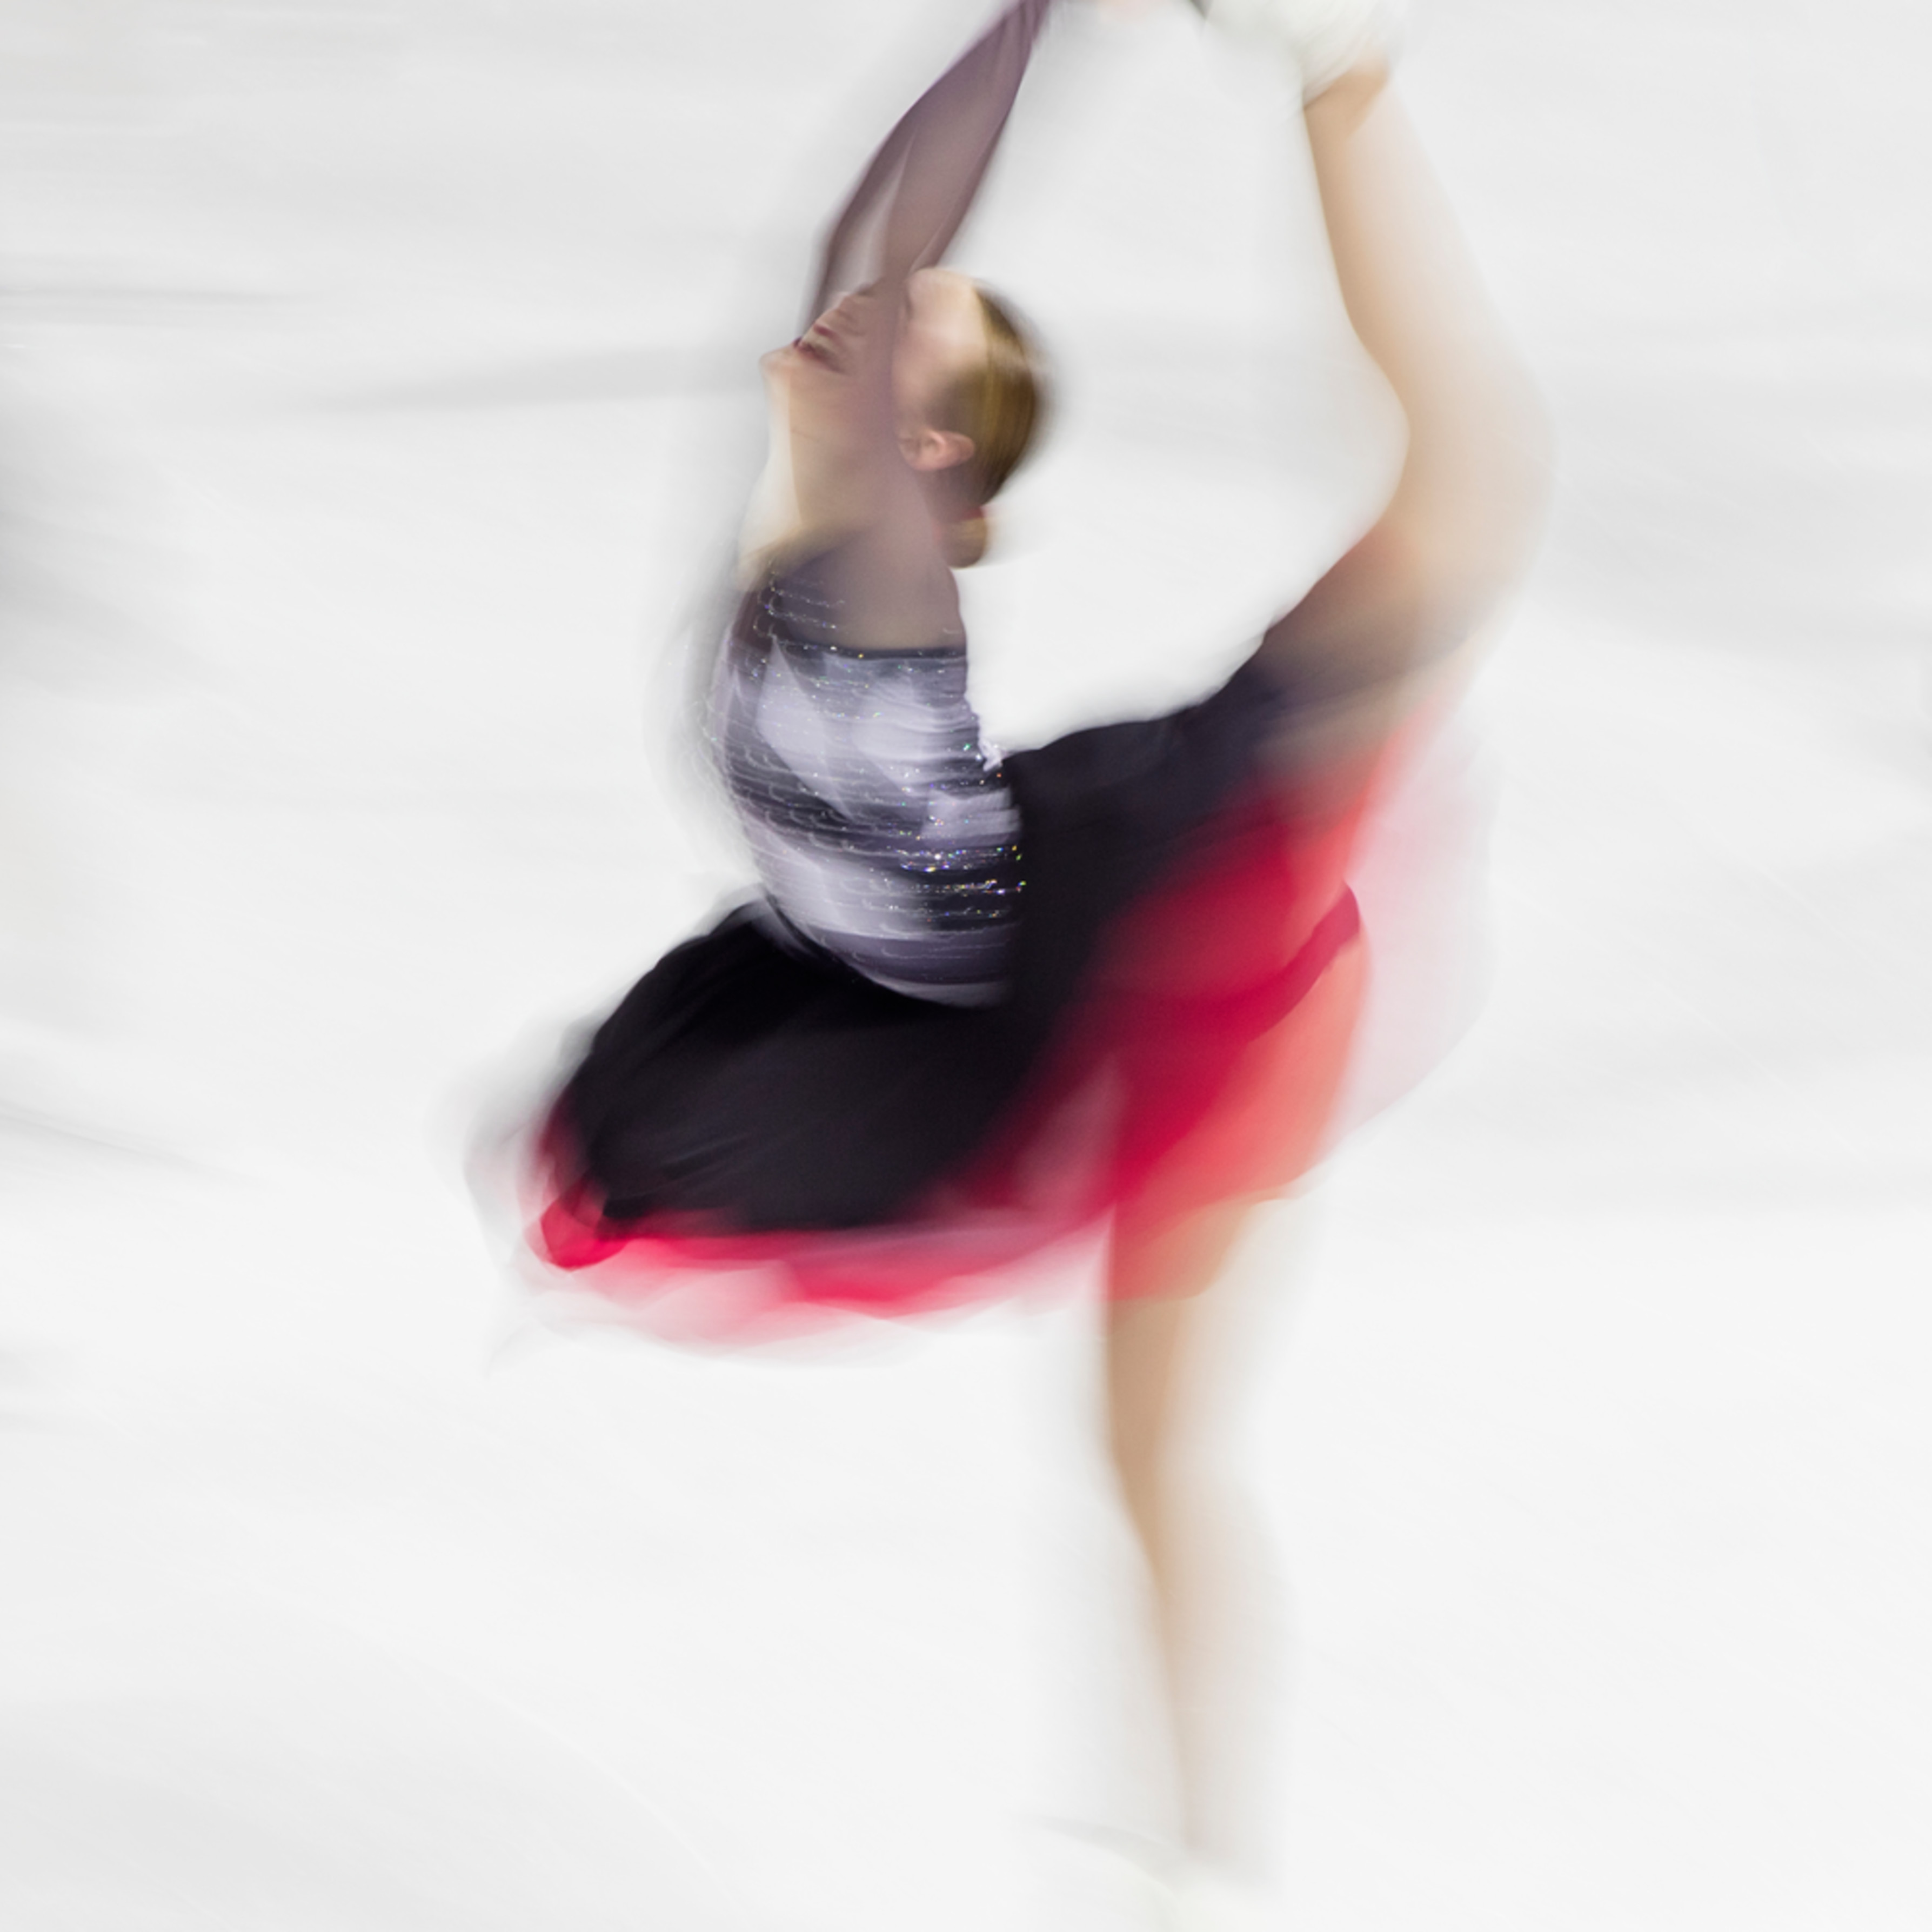 Abstract synchro skating nationals 2020 200229 4868 zlmqy5